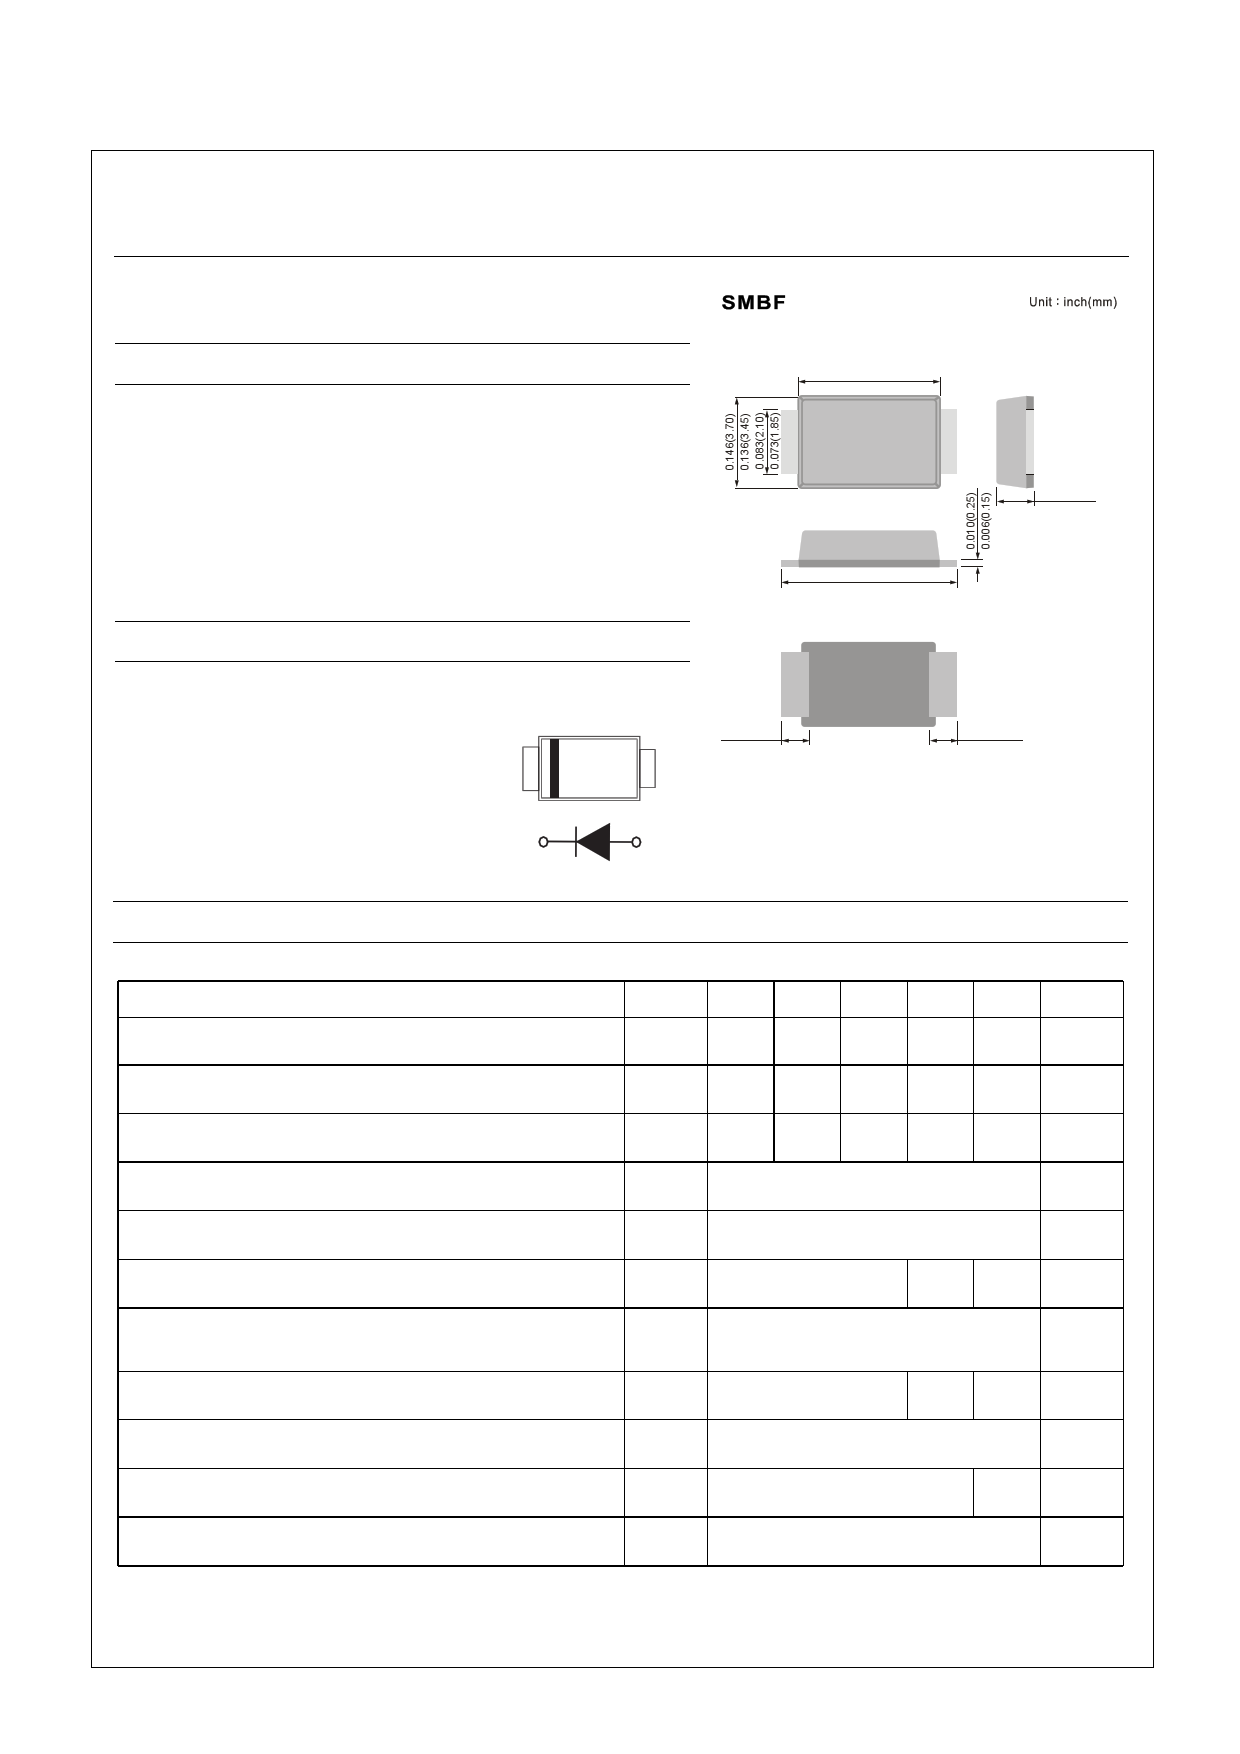 UF2JF 데이터시트 및 UF2JF PDF